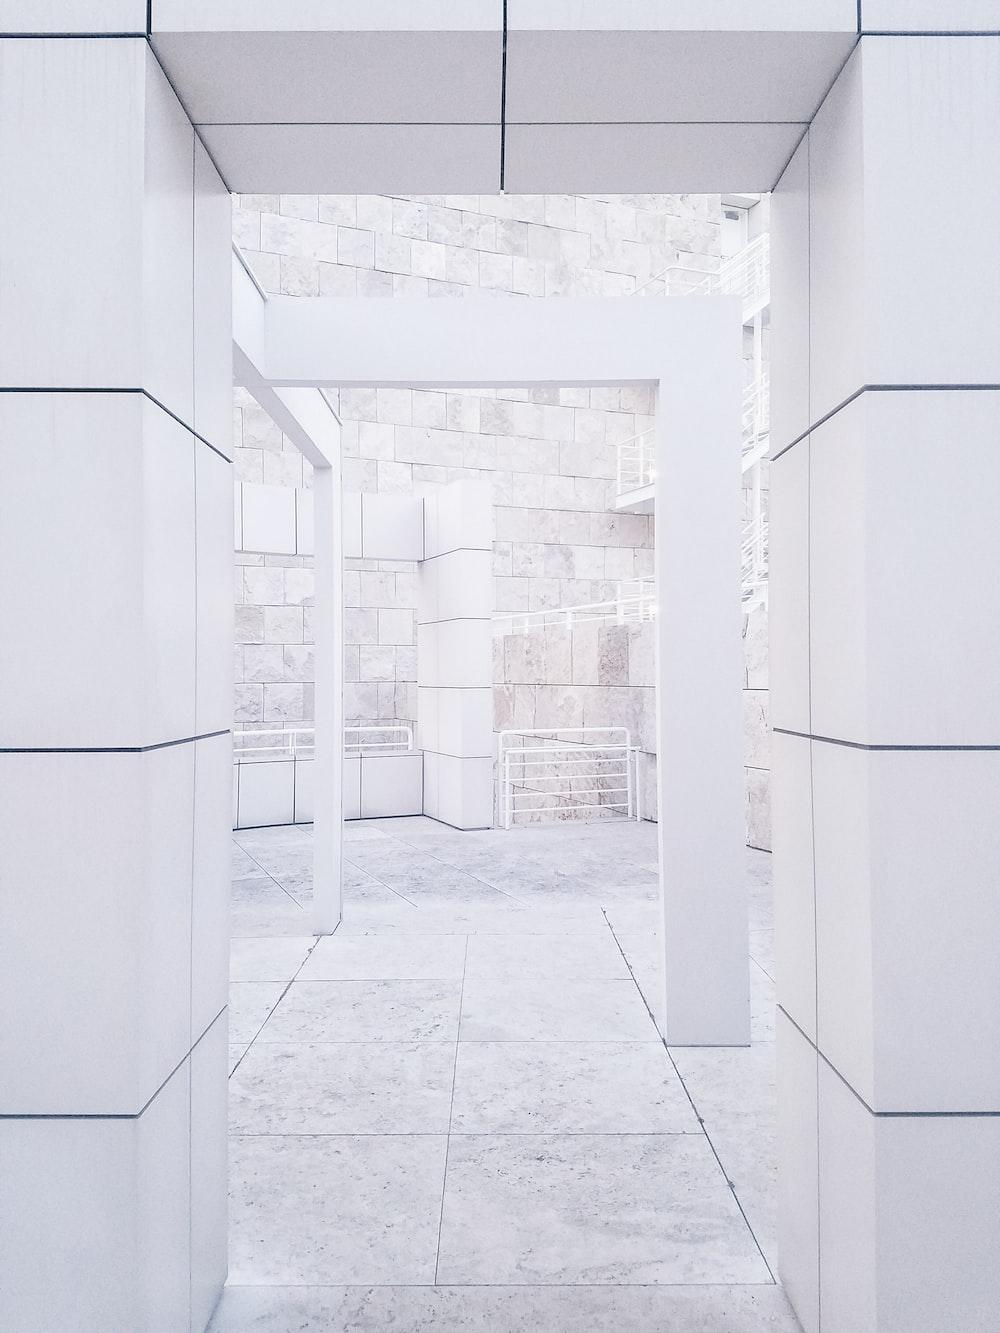 photo of empty arch hallway